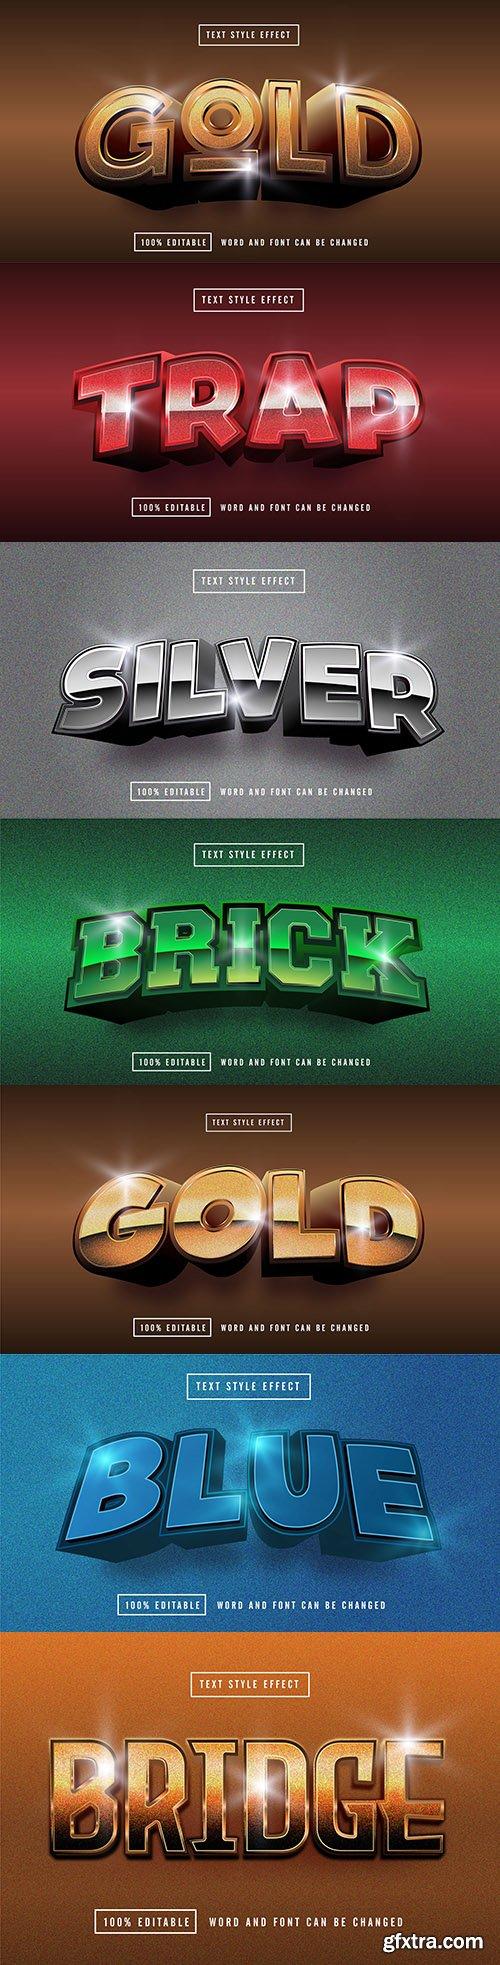 Editable font effect text collection illustration design 208